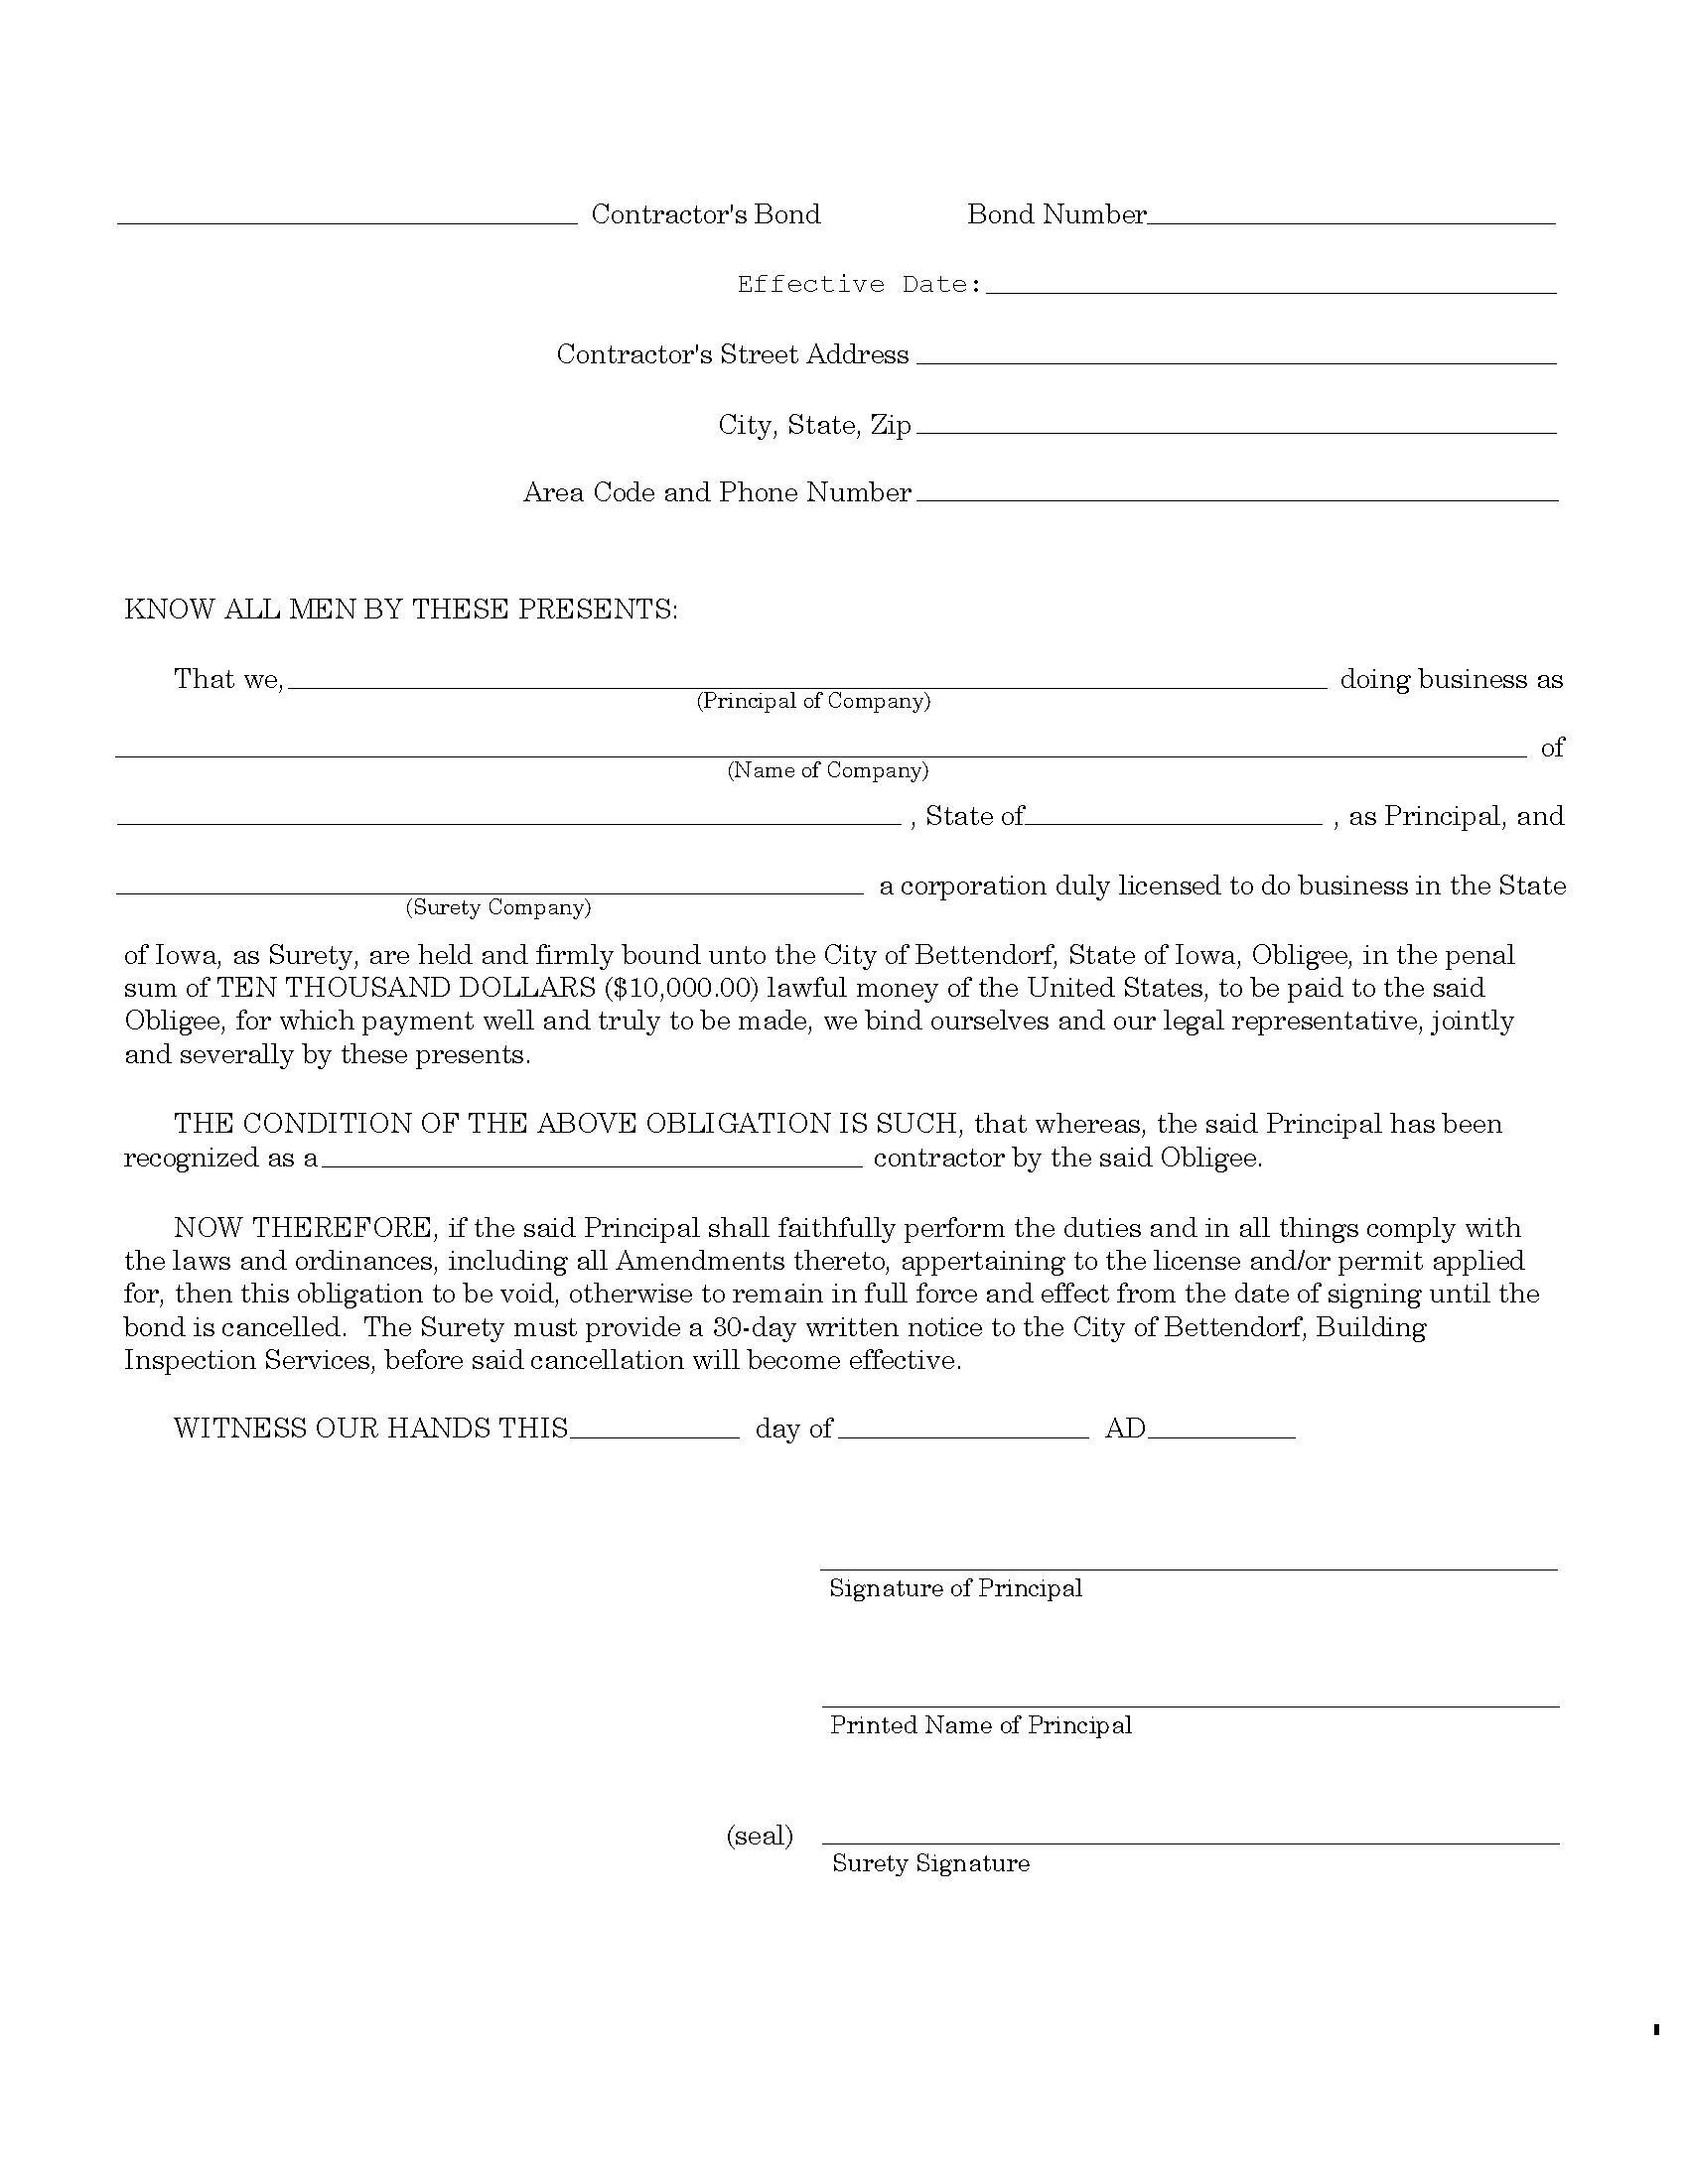 Marshall County Bettendorf - City License/Permit sample image